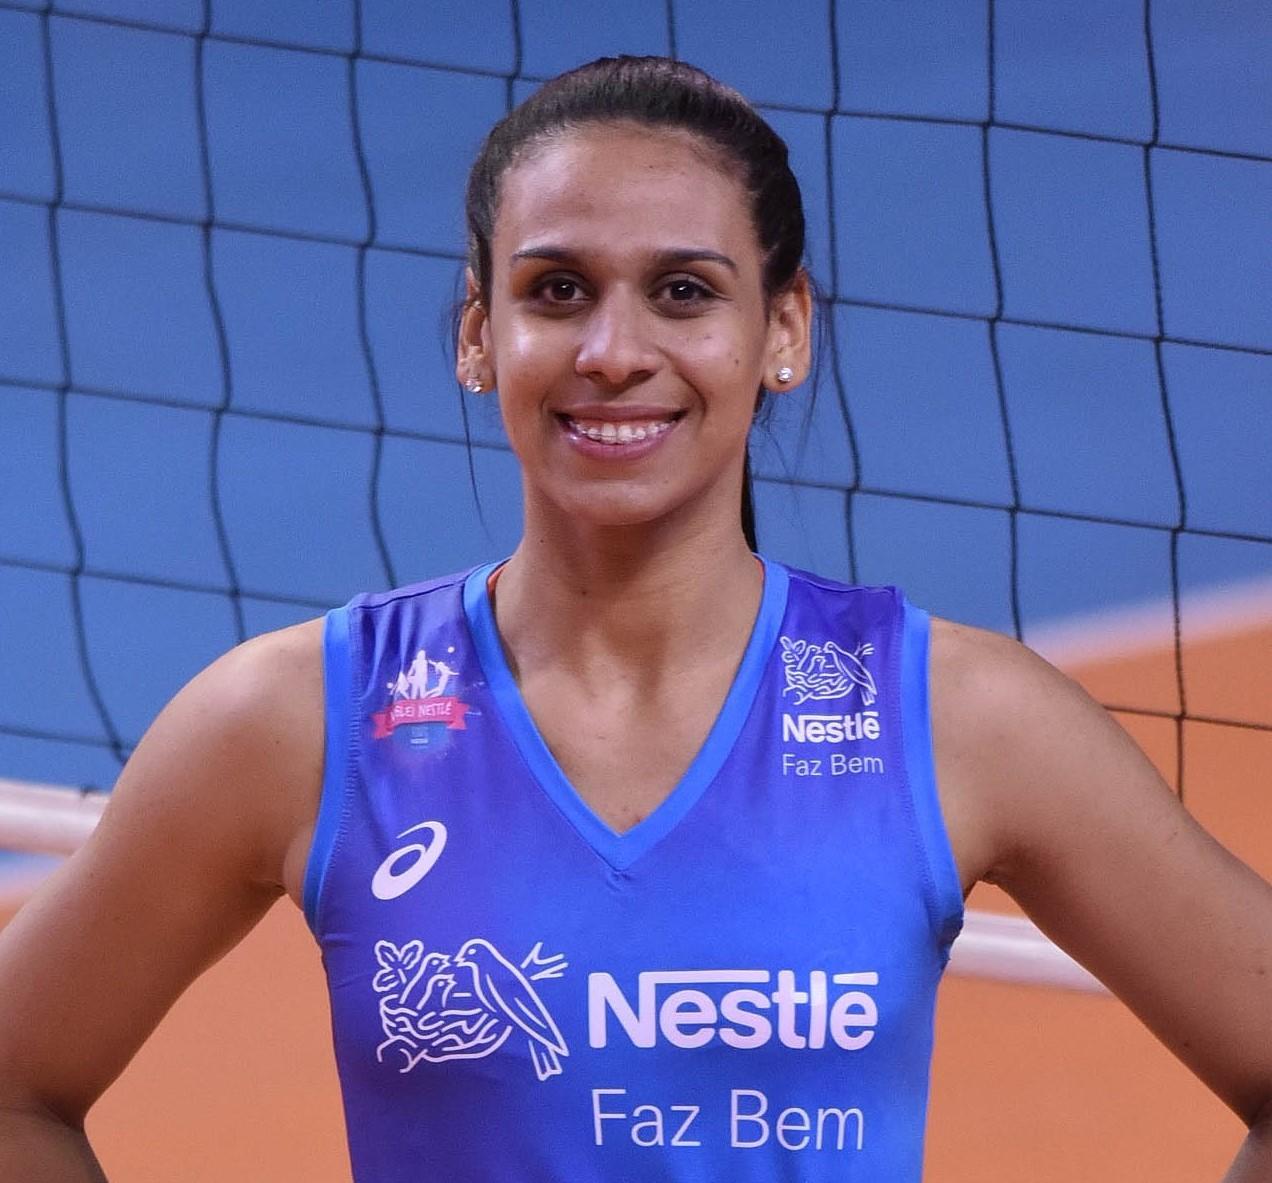 Ana Paula Borgo Bedani Da Cruz